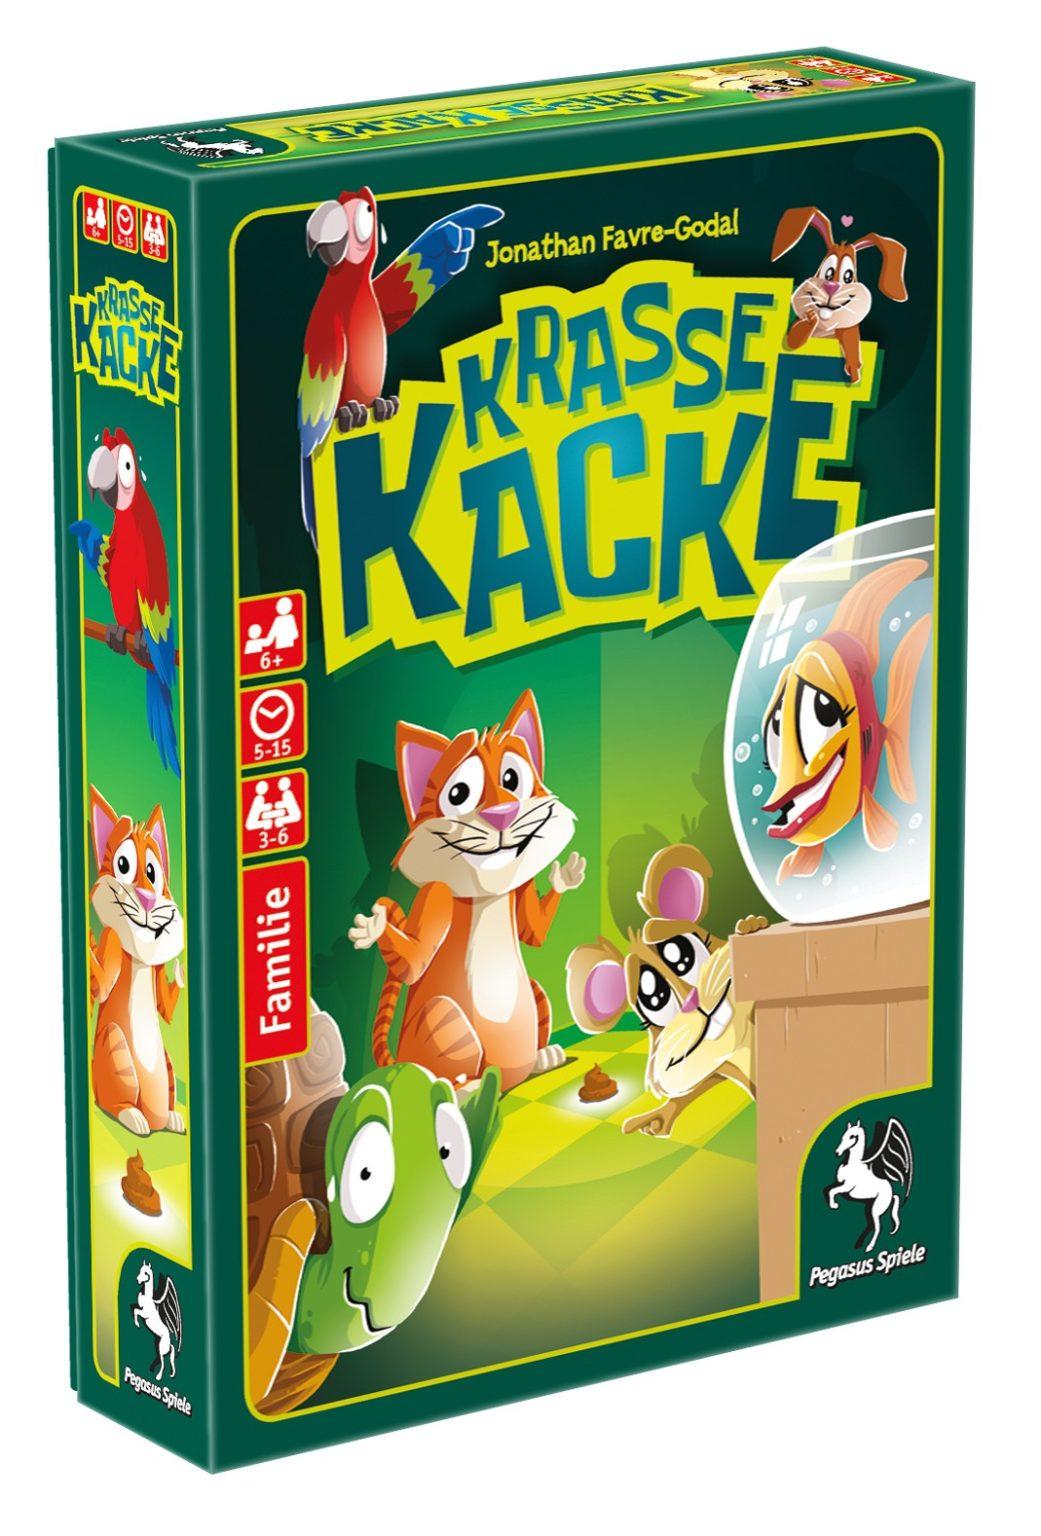 Krasse Kacke